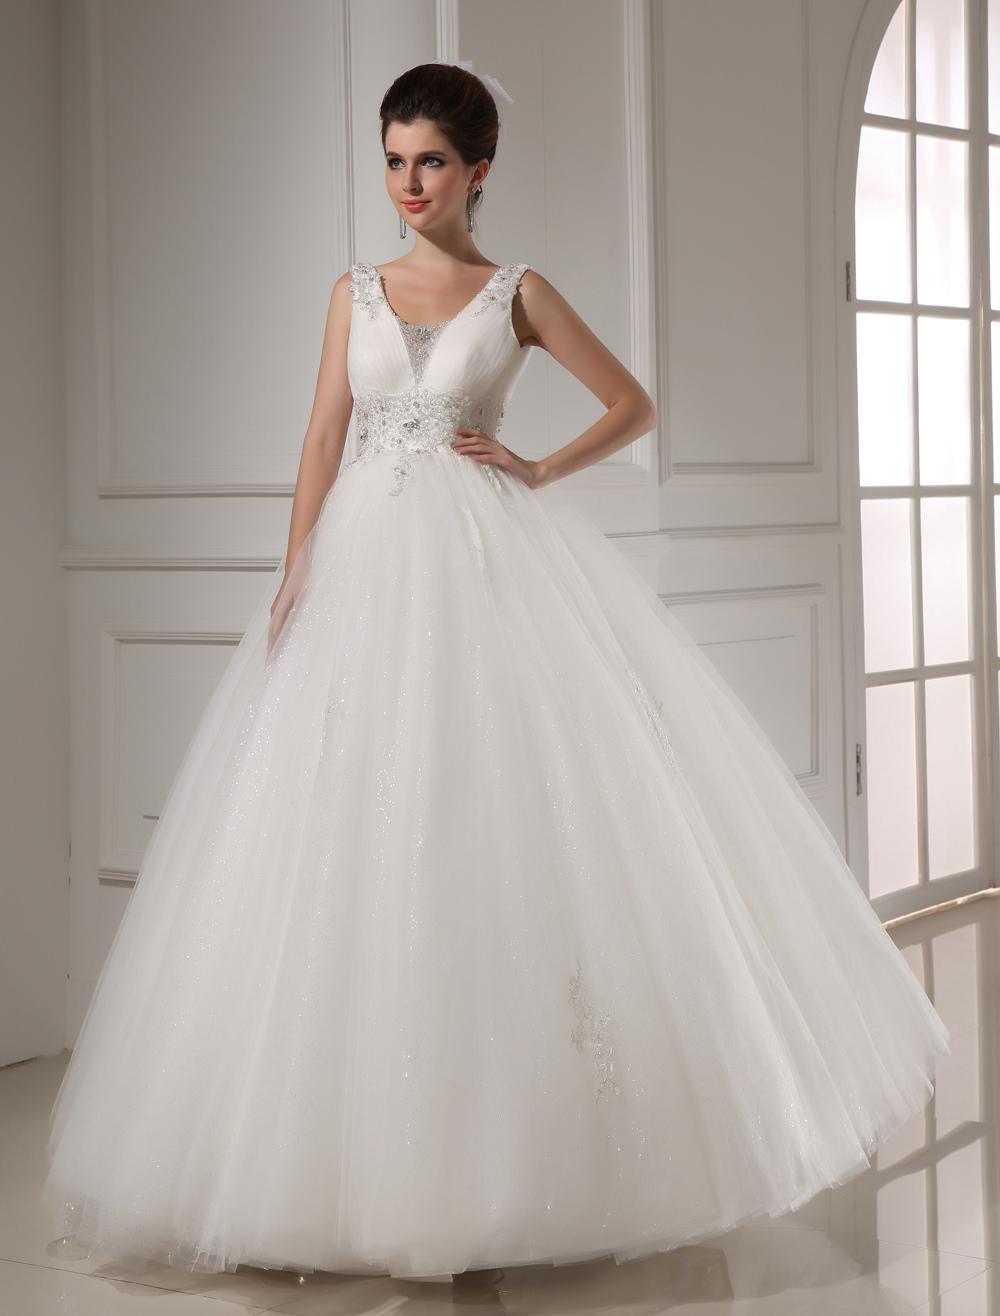 White Ball Gown Beading Tulle Bridal Wedding Dress